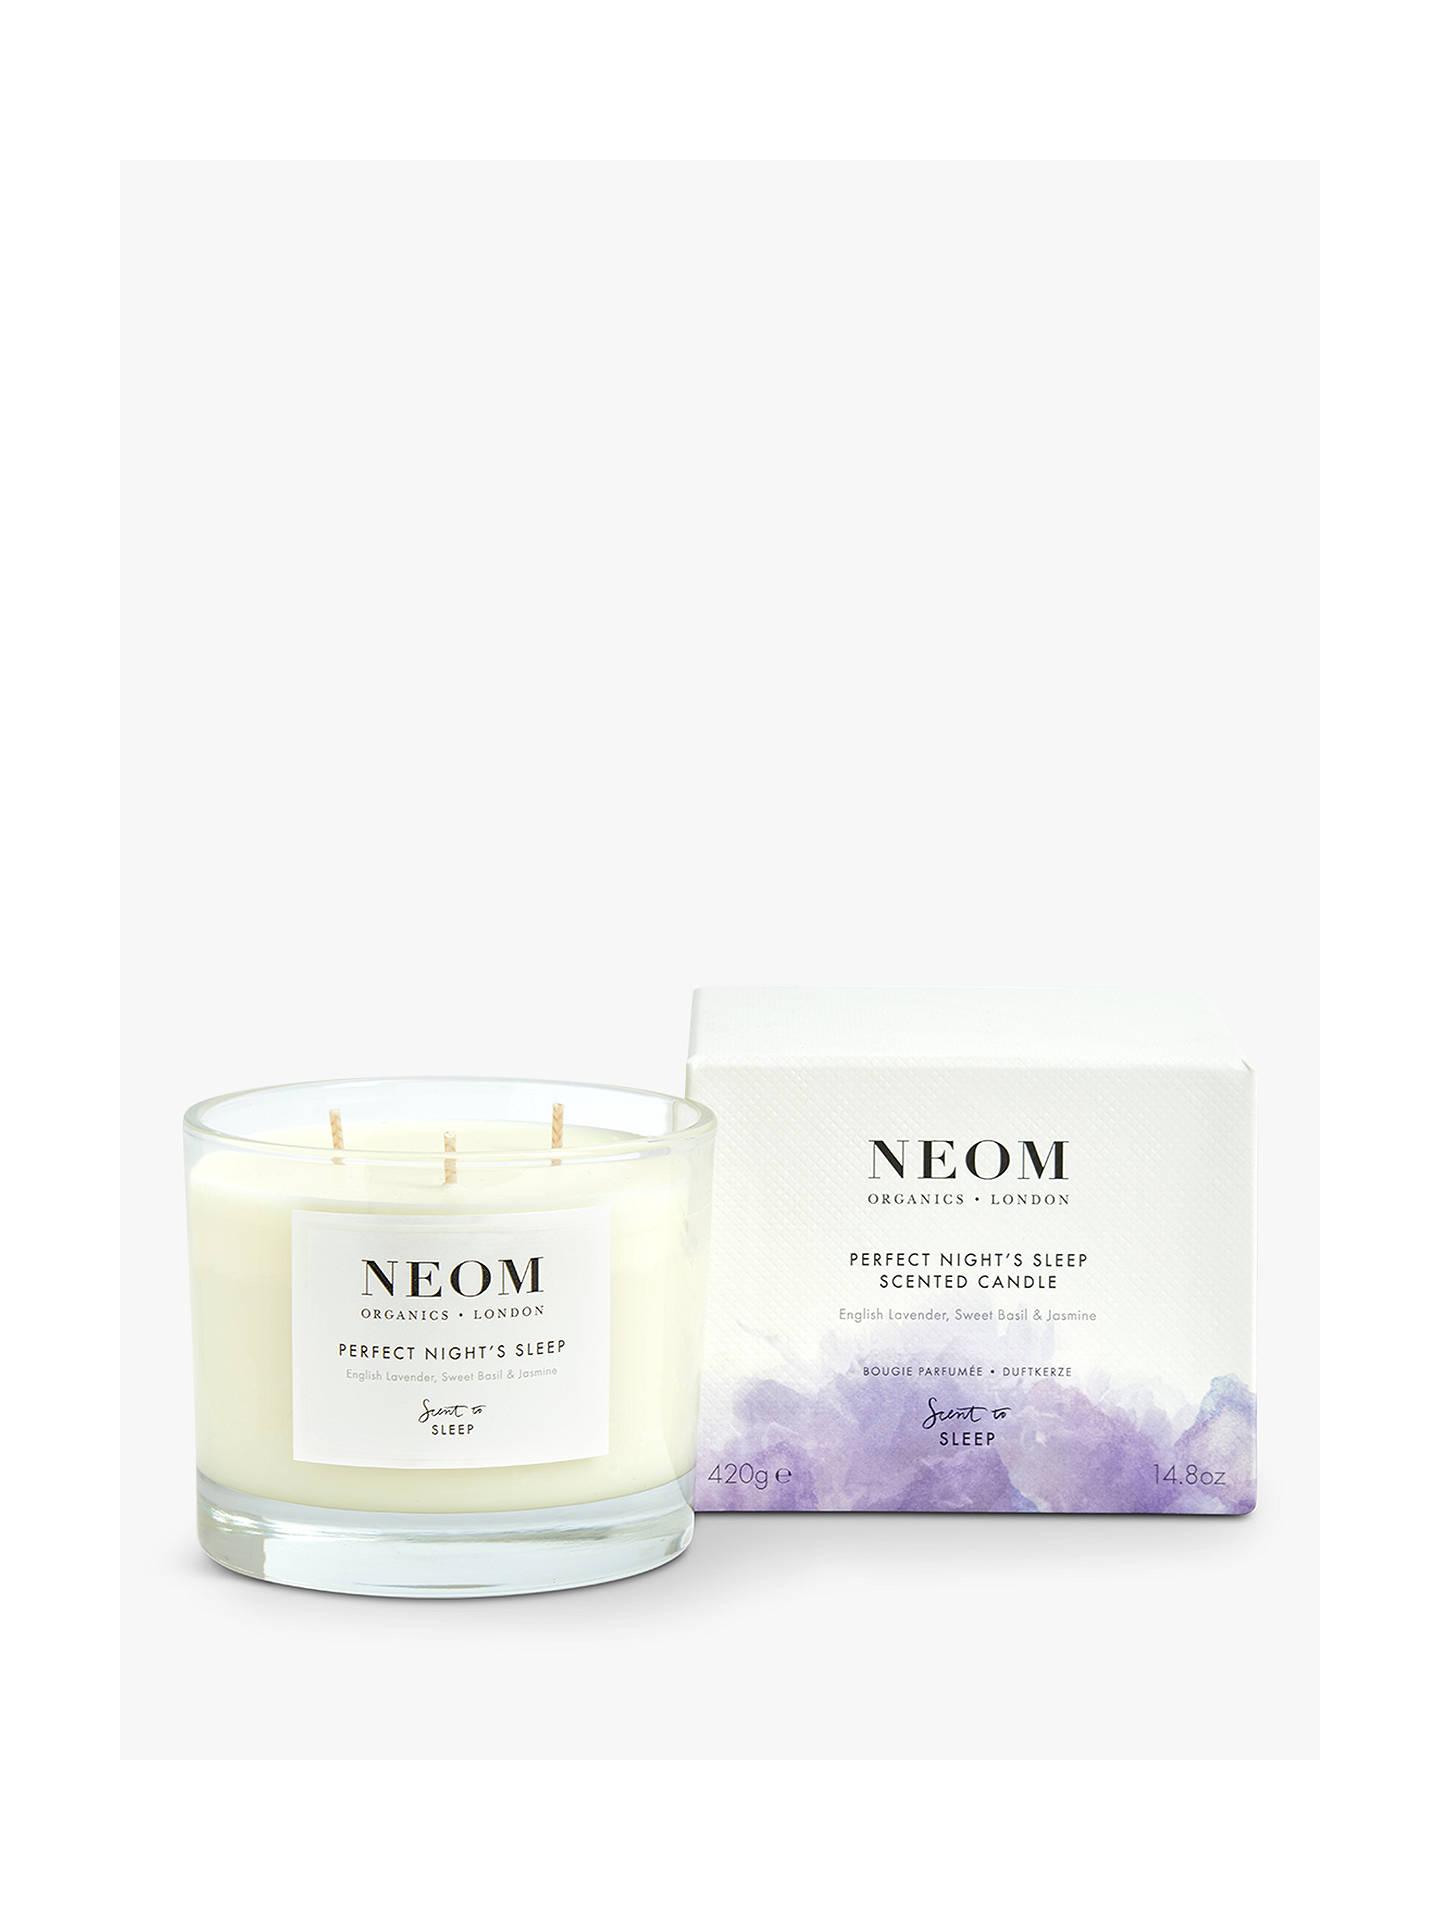 Nom Organics London Tranquility Candle